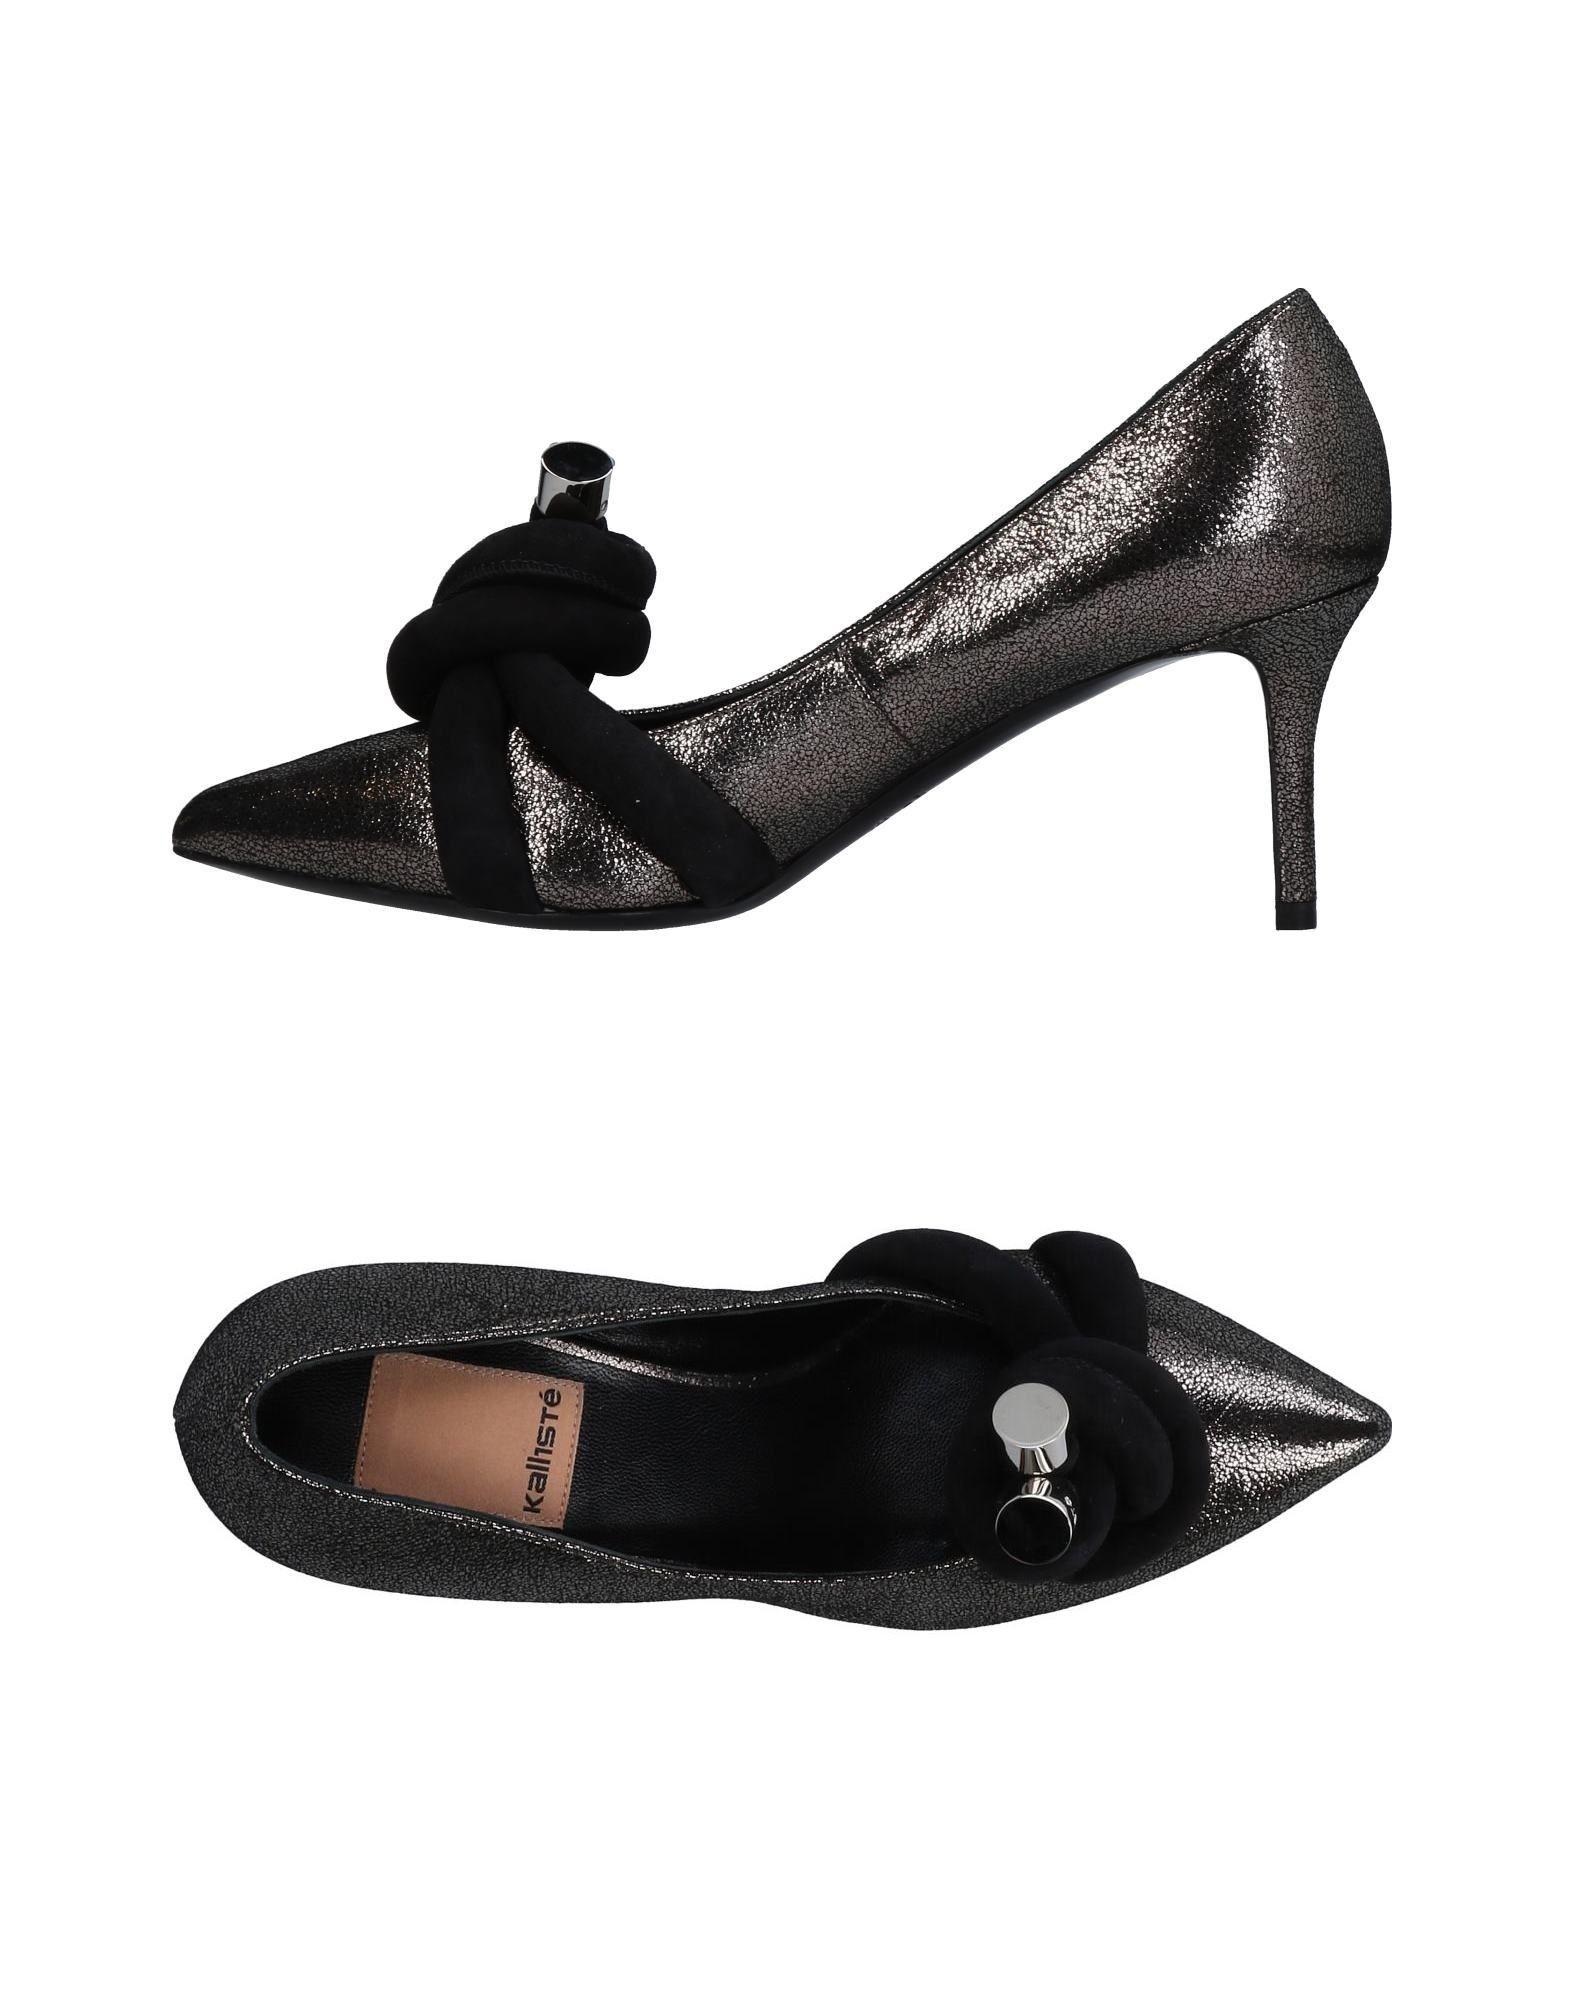 Haltbare Mode billige Schuhe  Kallistè Pumps Damen  Schuhe 11460373NQ Heiße Schuhe 8199b2